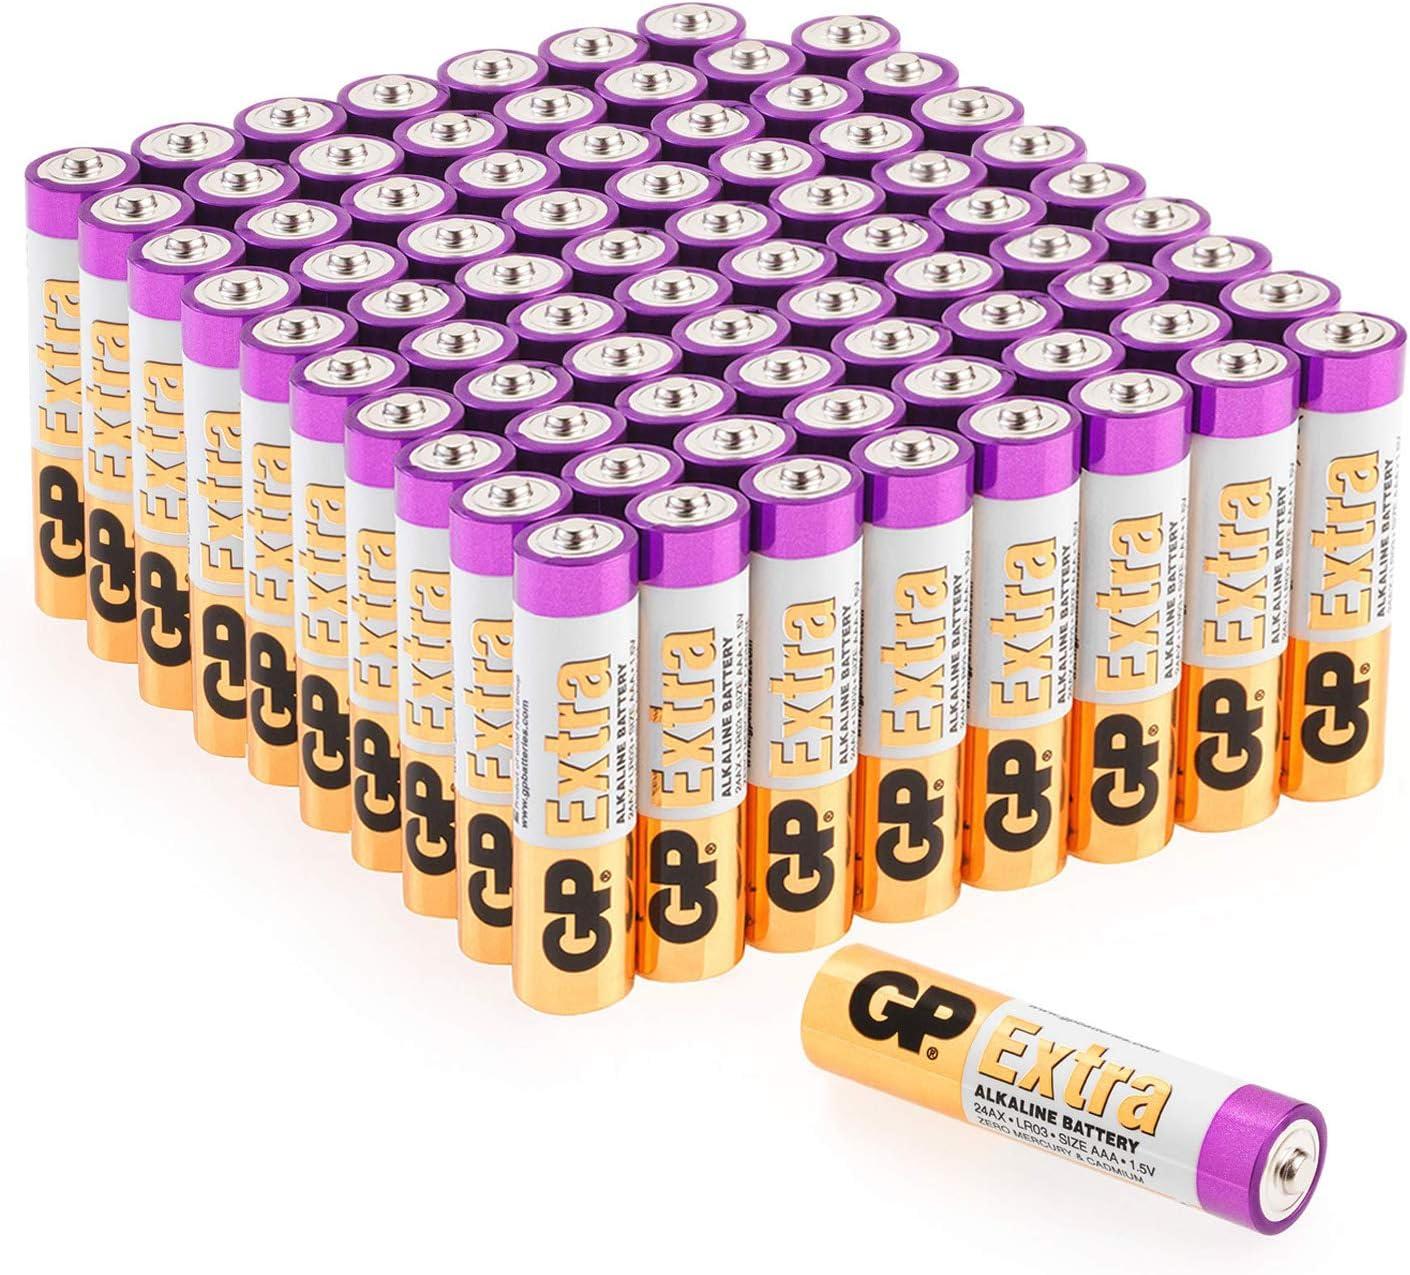 Gp Extra Alkaline Batterien Aaa Longlife 80 Stück Elektronik